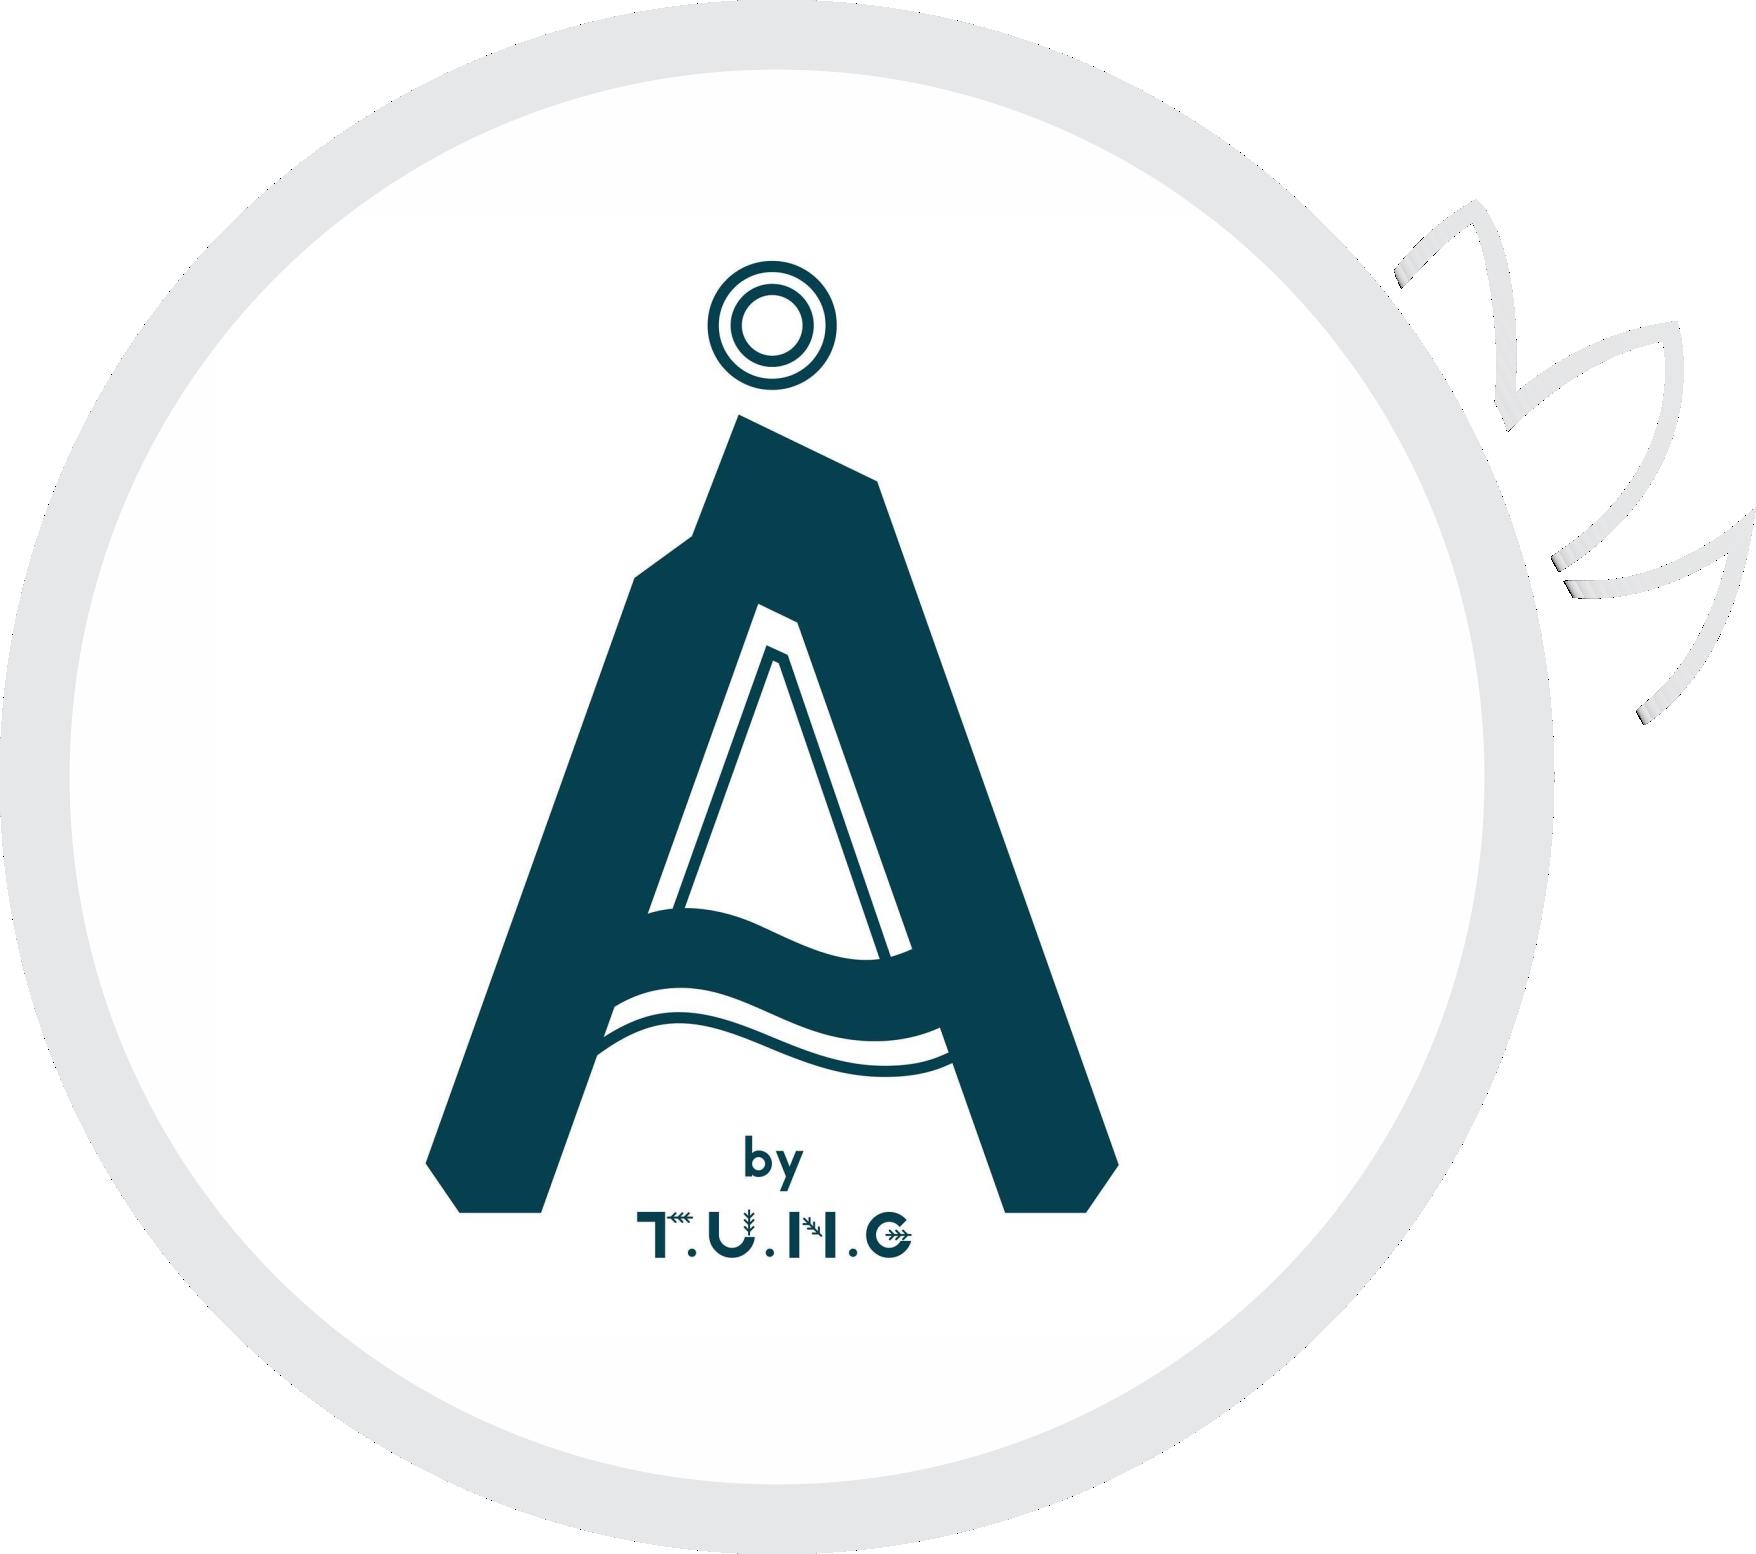 a by tung logo